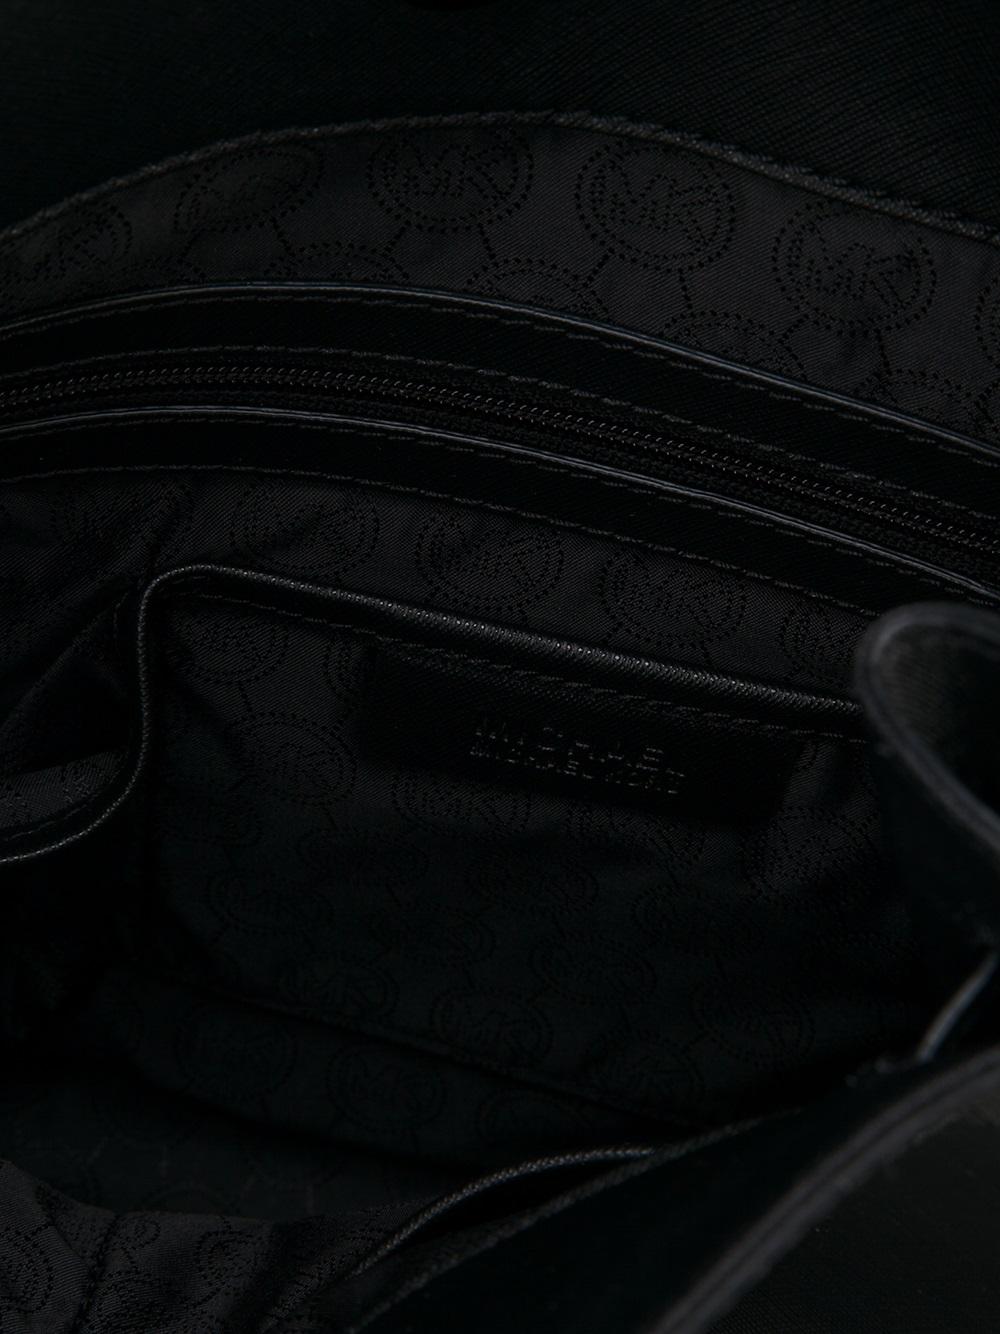 MICHAEL Michael Kors Hamilton Large Tote in Black